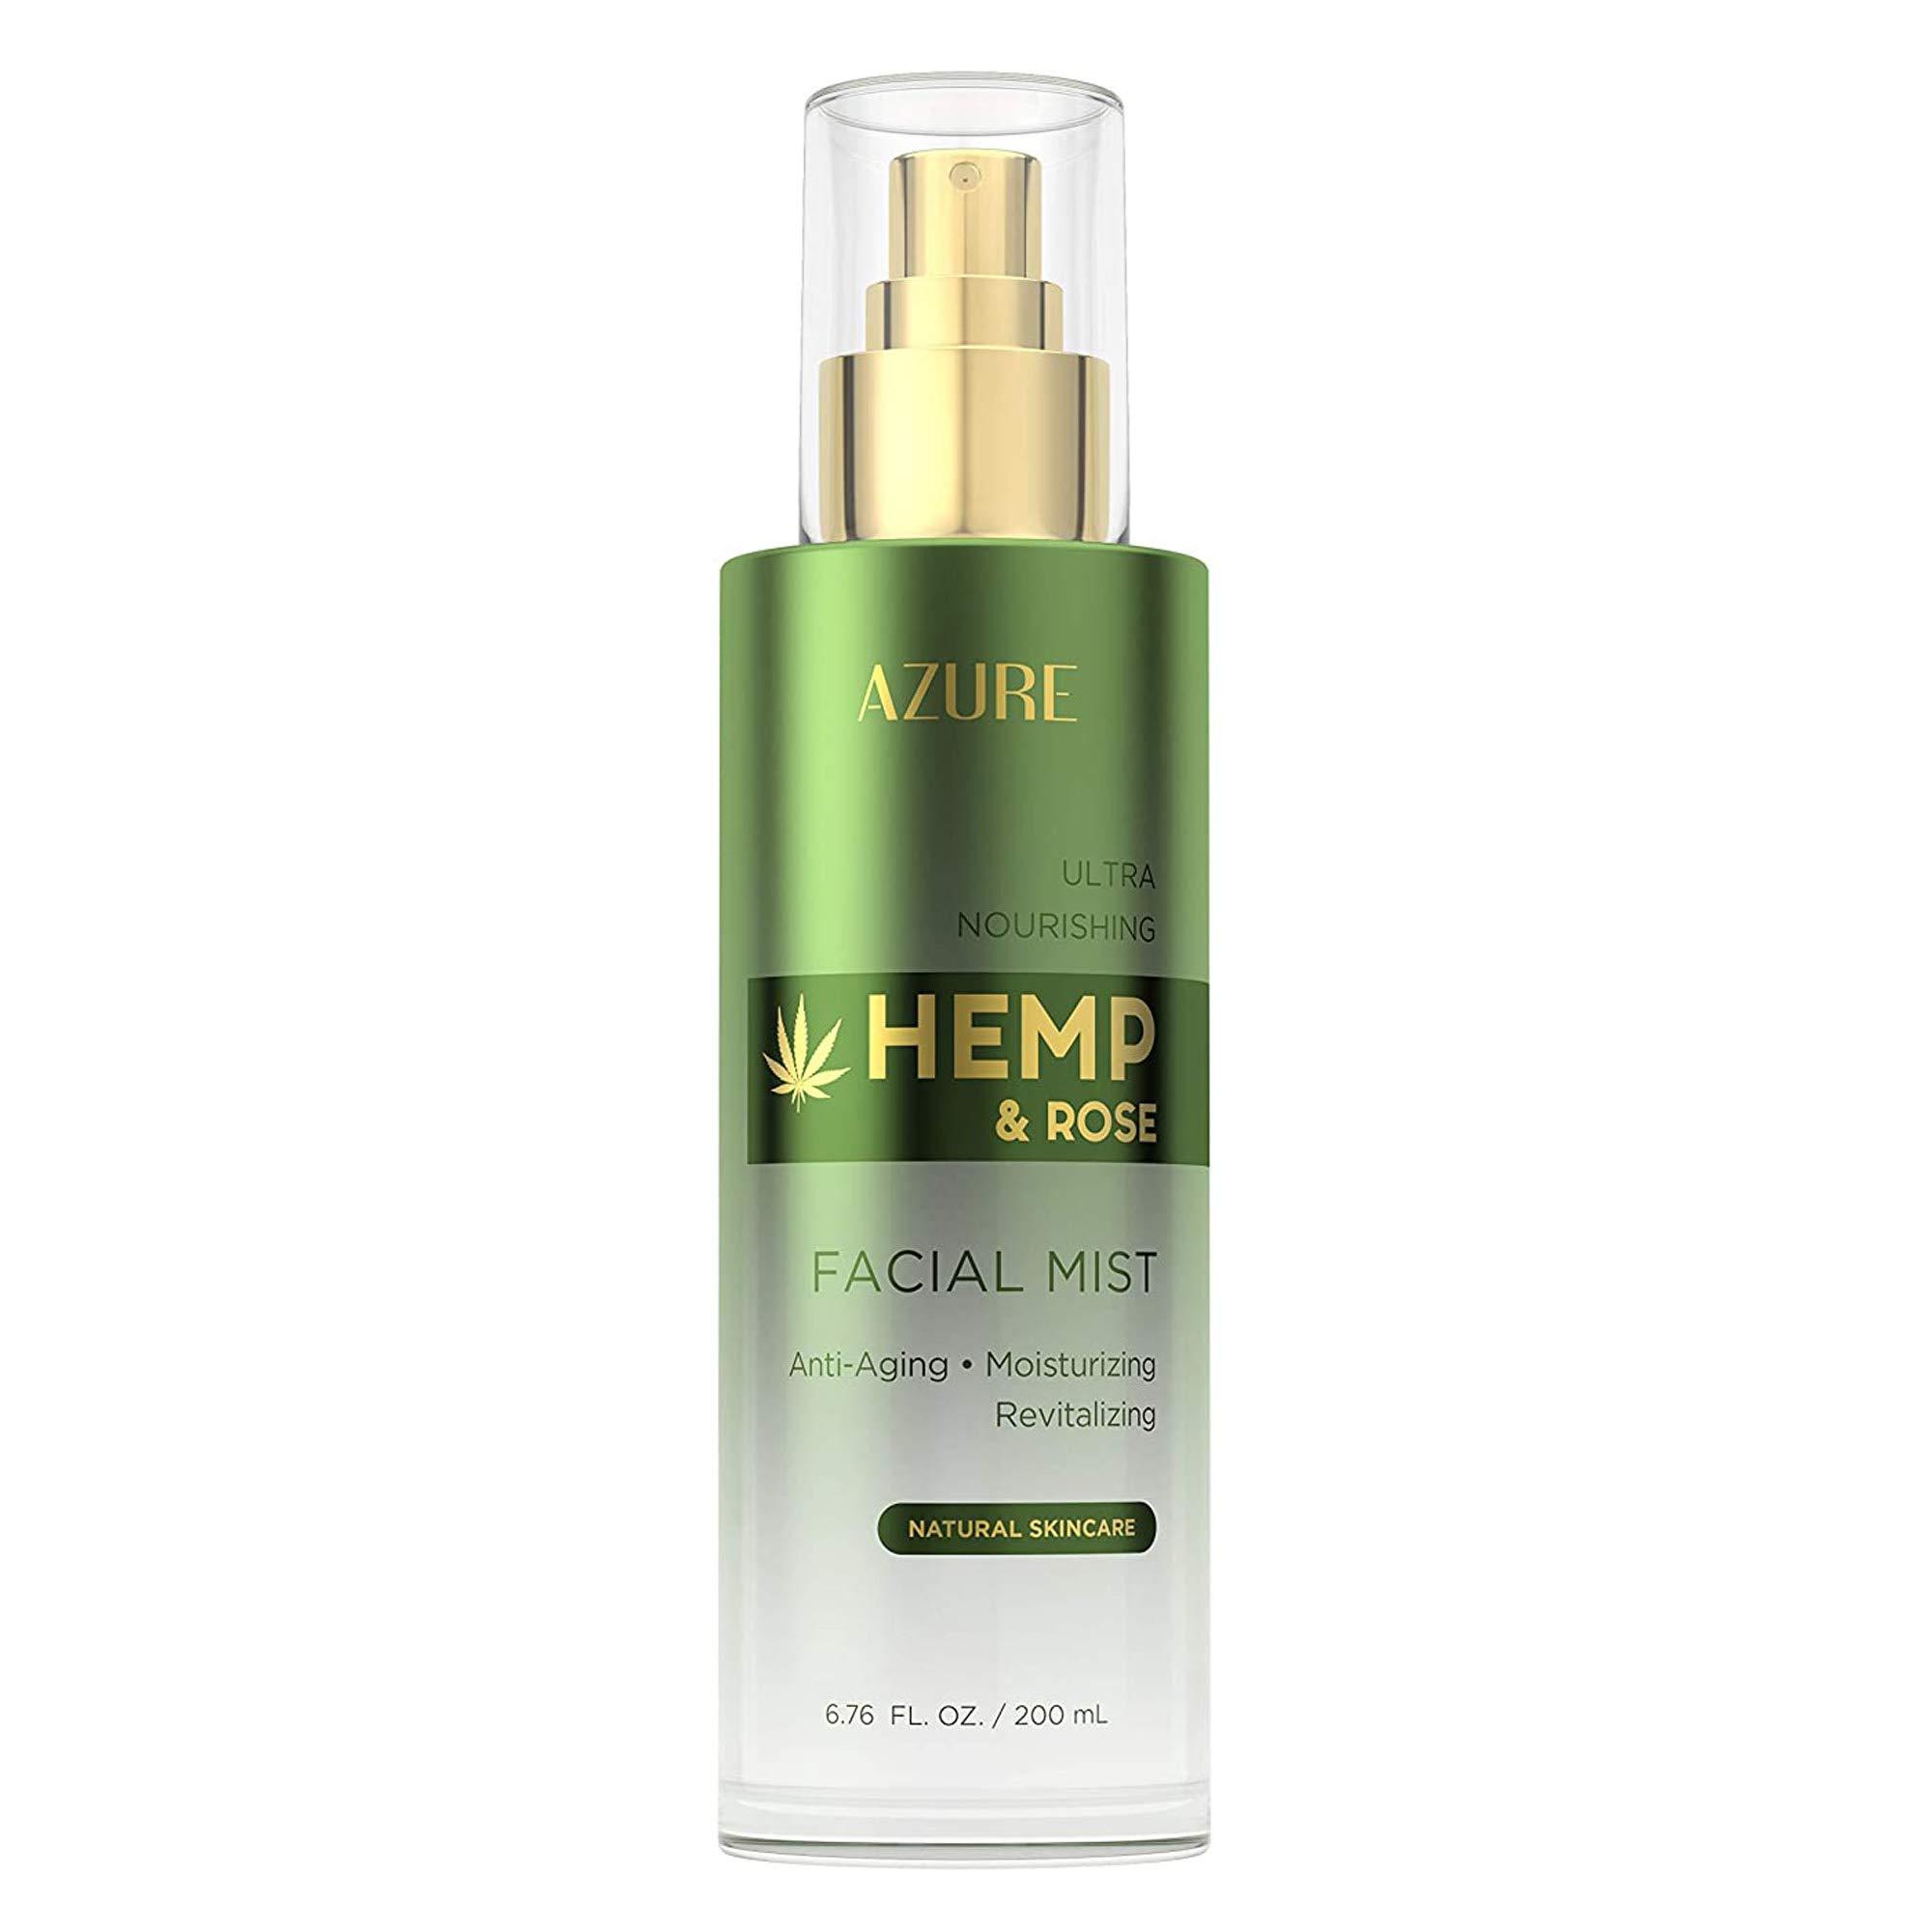 AZURE Hemp & Rose Ultra Nourishing Face Mist Toner - Anti Aging, Moisturizing & Revitalizing   W/Vitamins & Antioxidants   Rejuvenates Tired, Dehydrated Skin   Made in Korea - 200mL